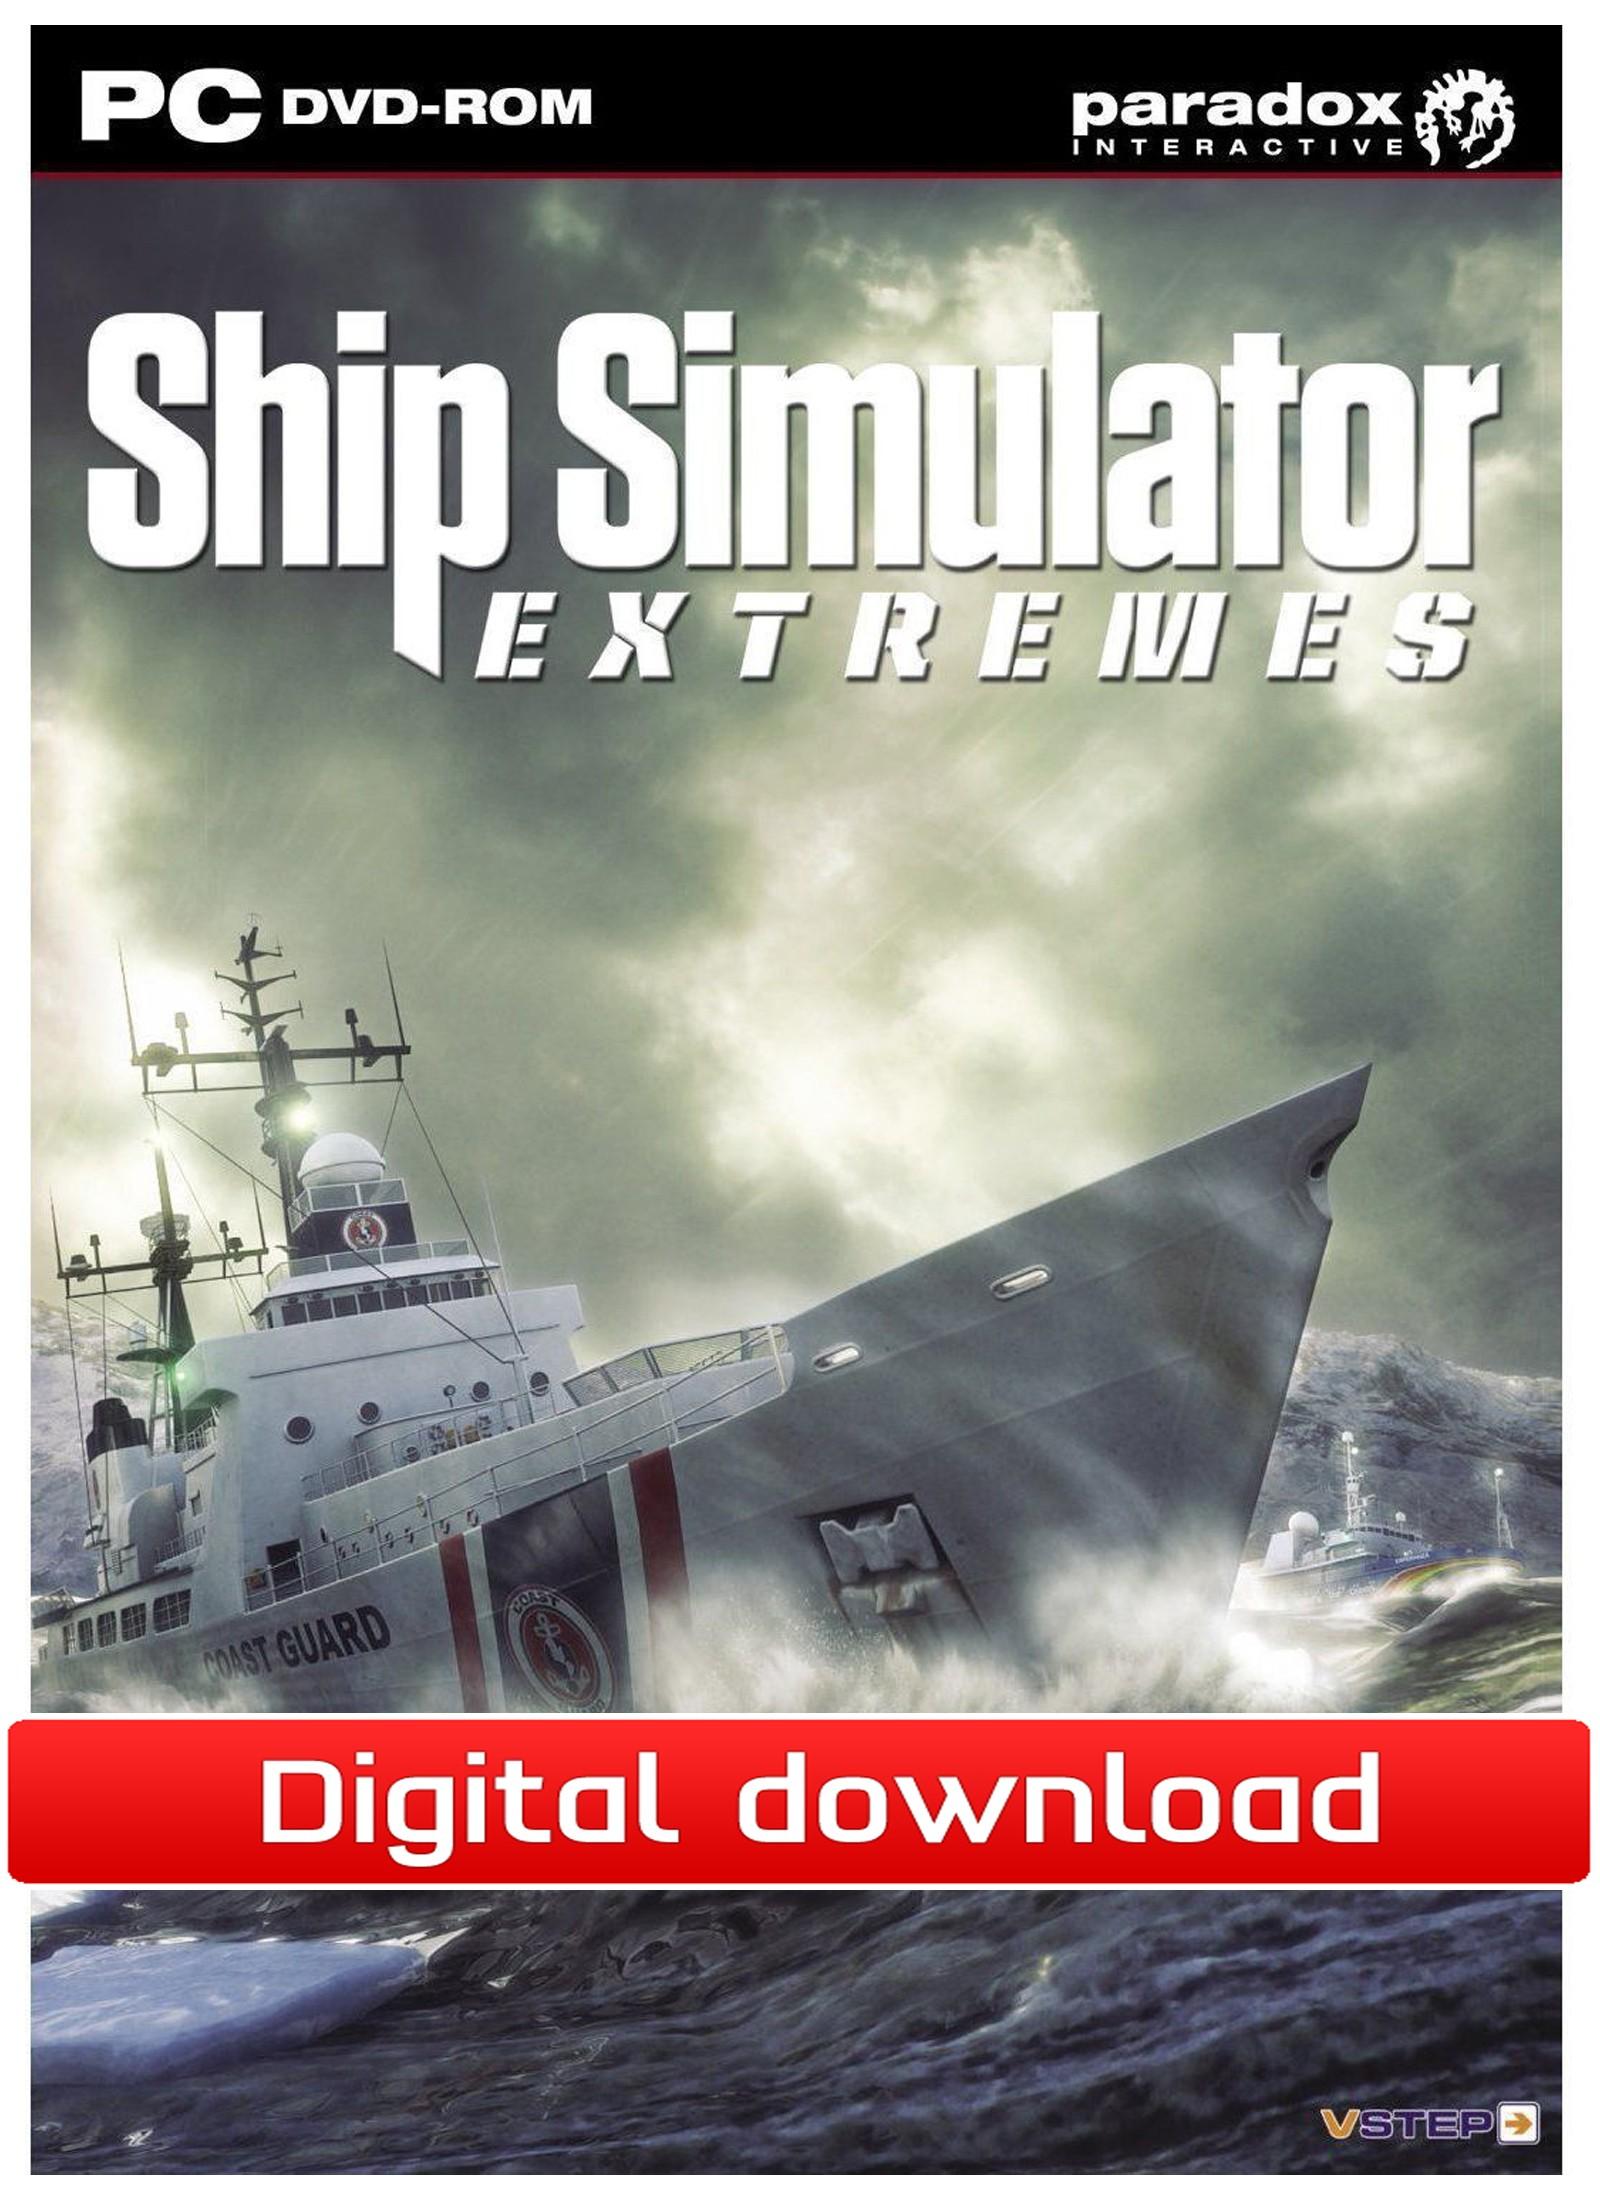 Ship Simulator Extremes (PC nedlastning) PCDD24323